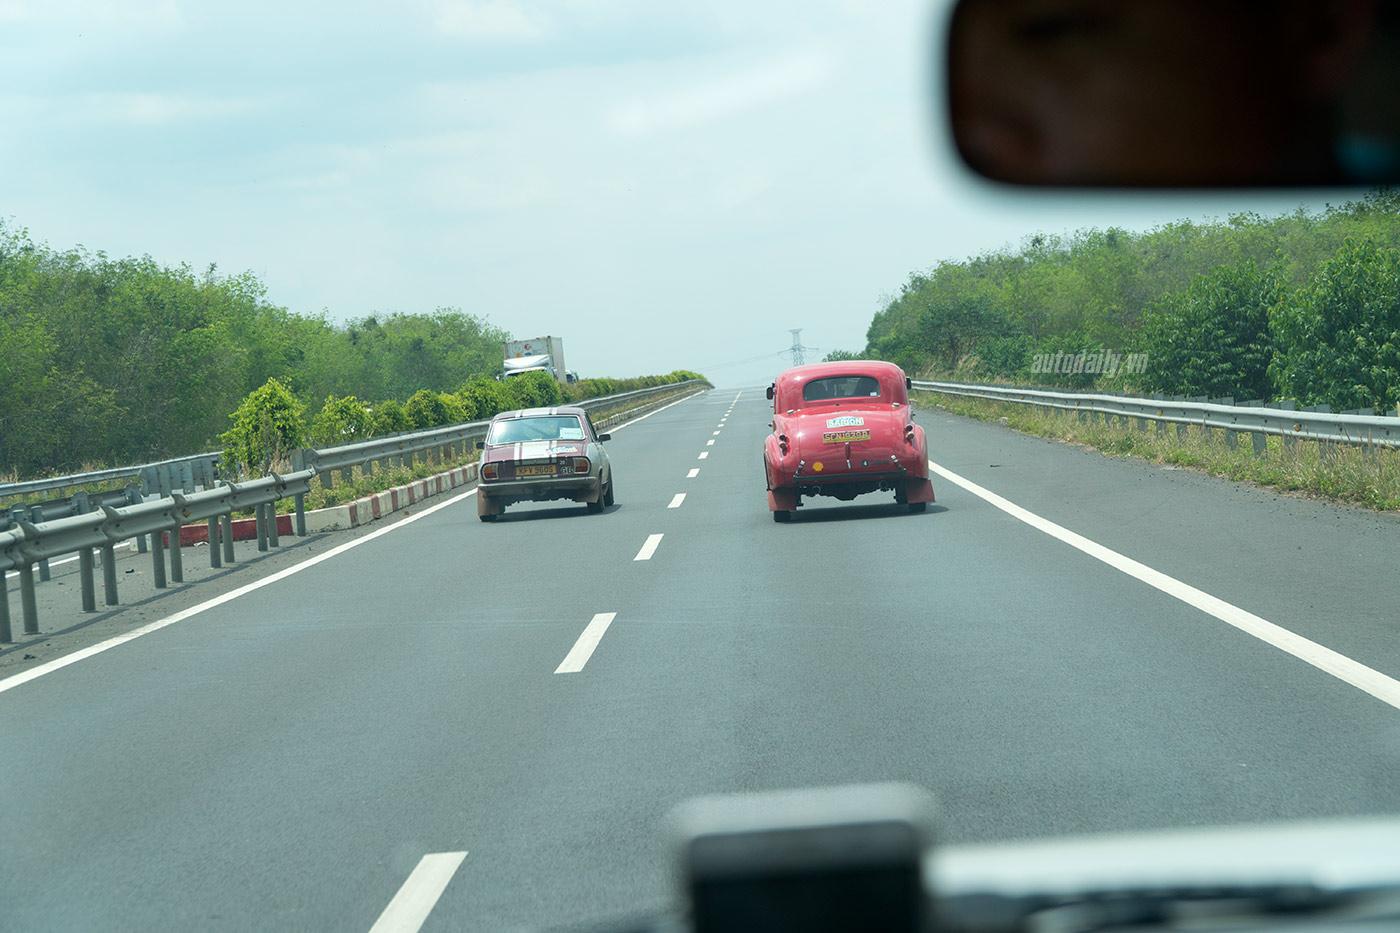 the-road-to-saigon-2018-autodaily-015-1.jpg